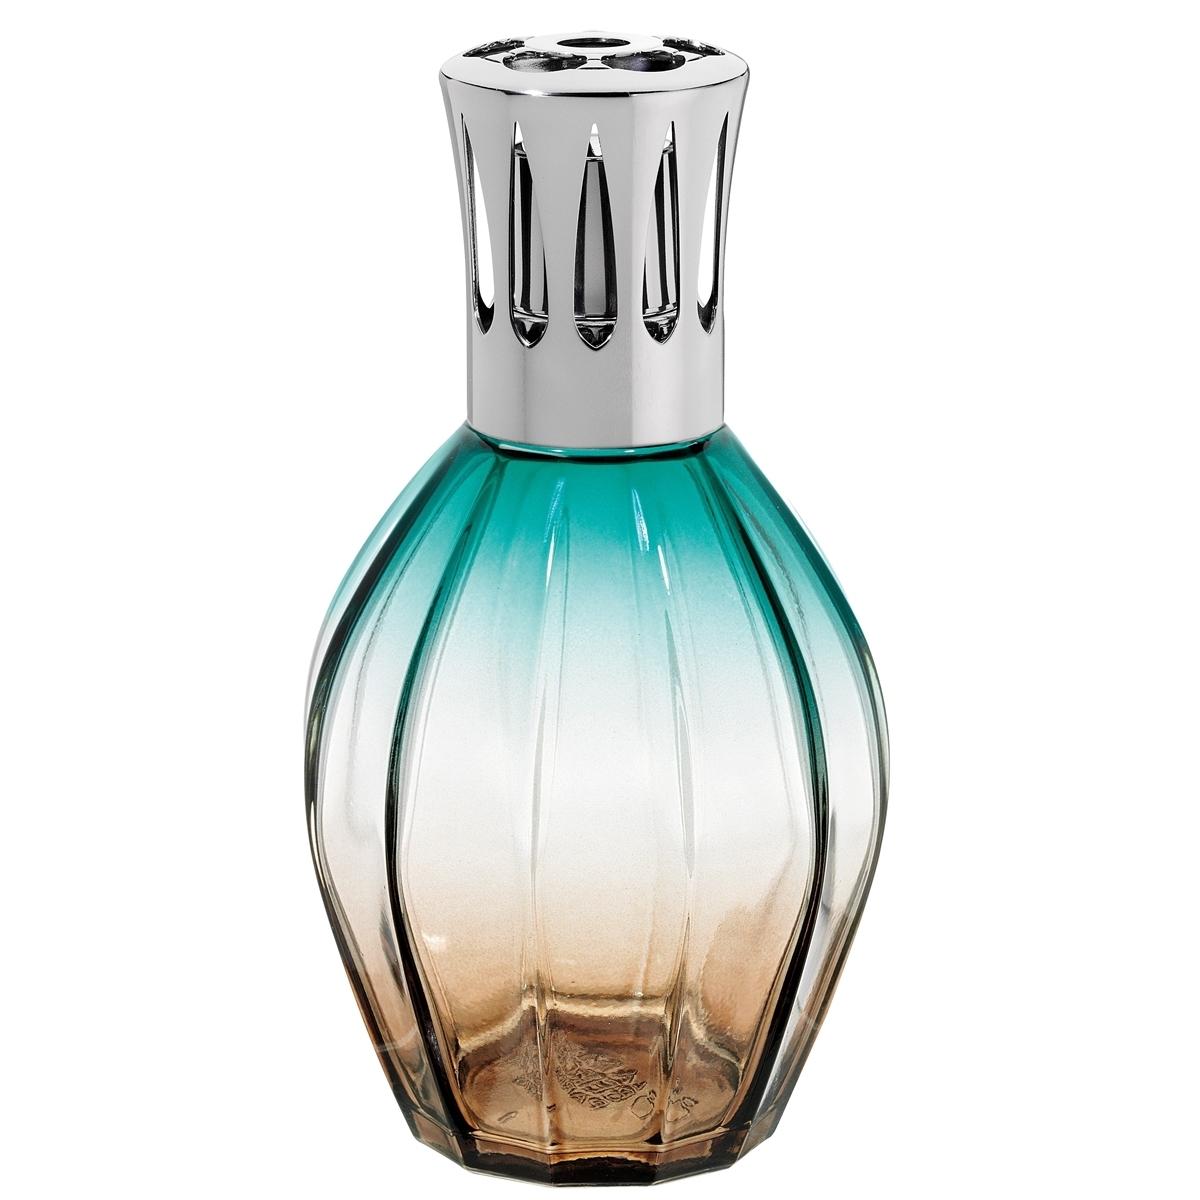 Аромалампа Lampe Berger Зелин 316 мл